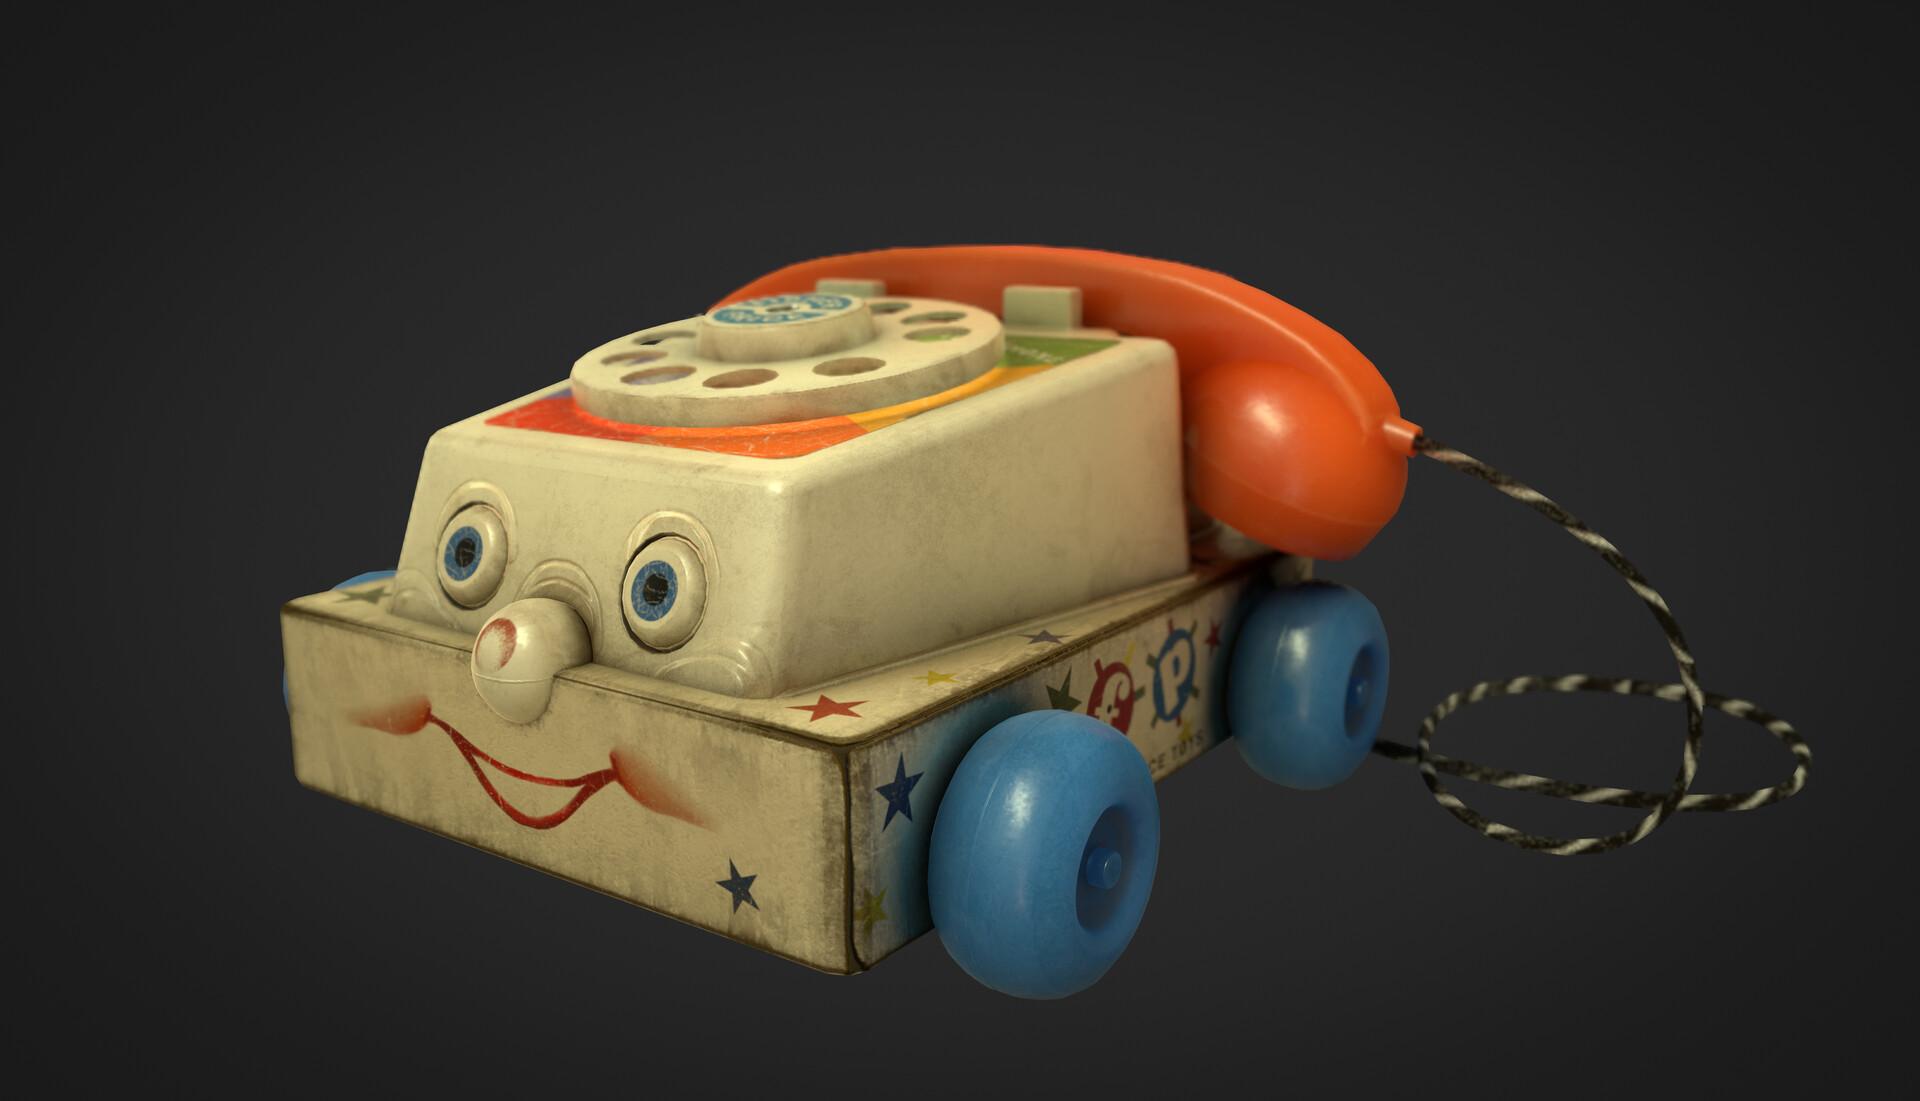 Hanna stenow chatterphone1